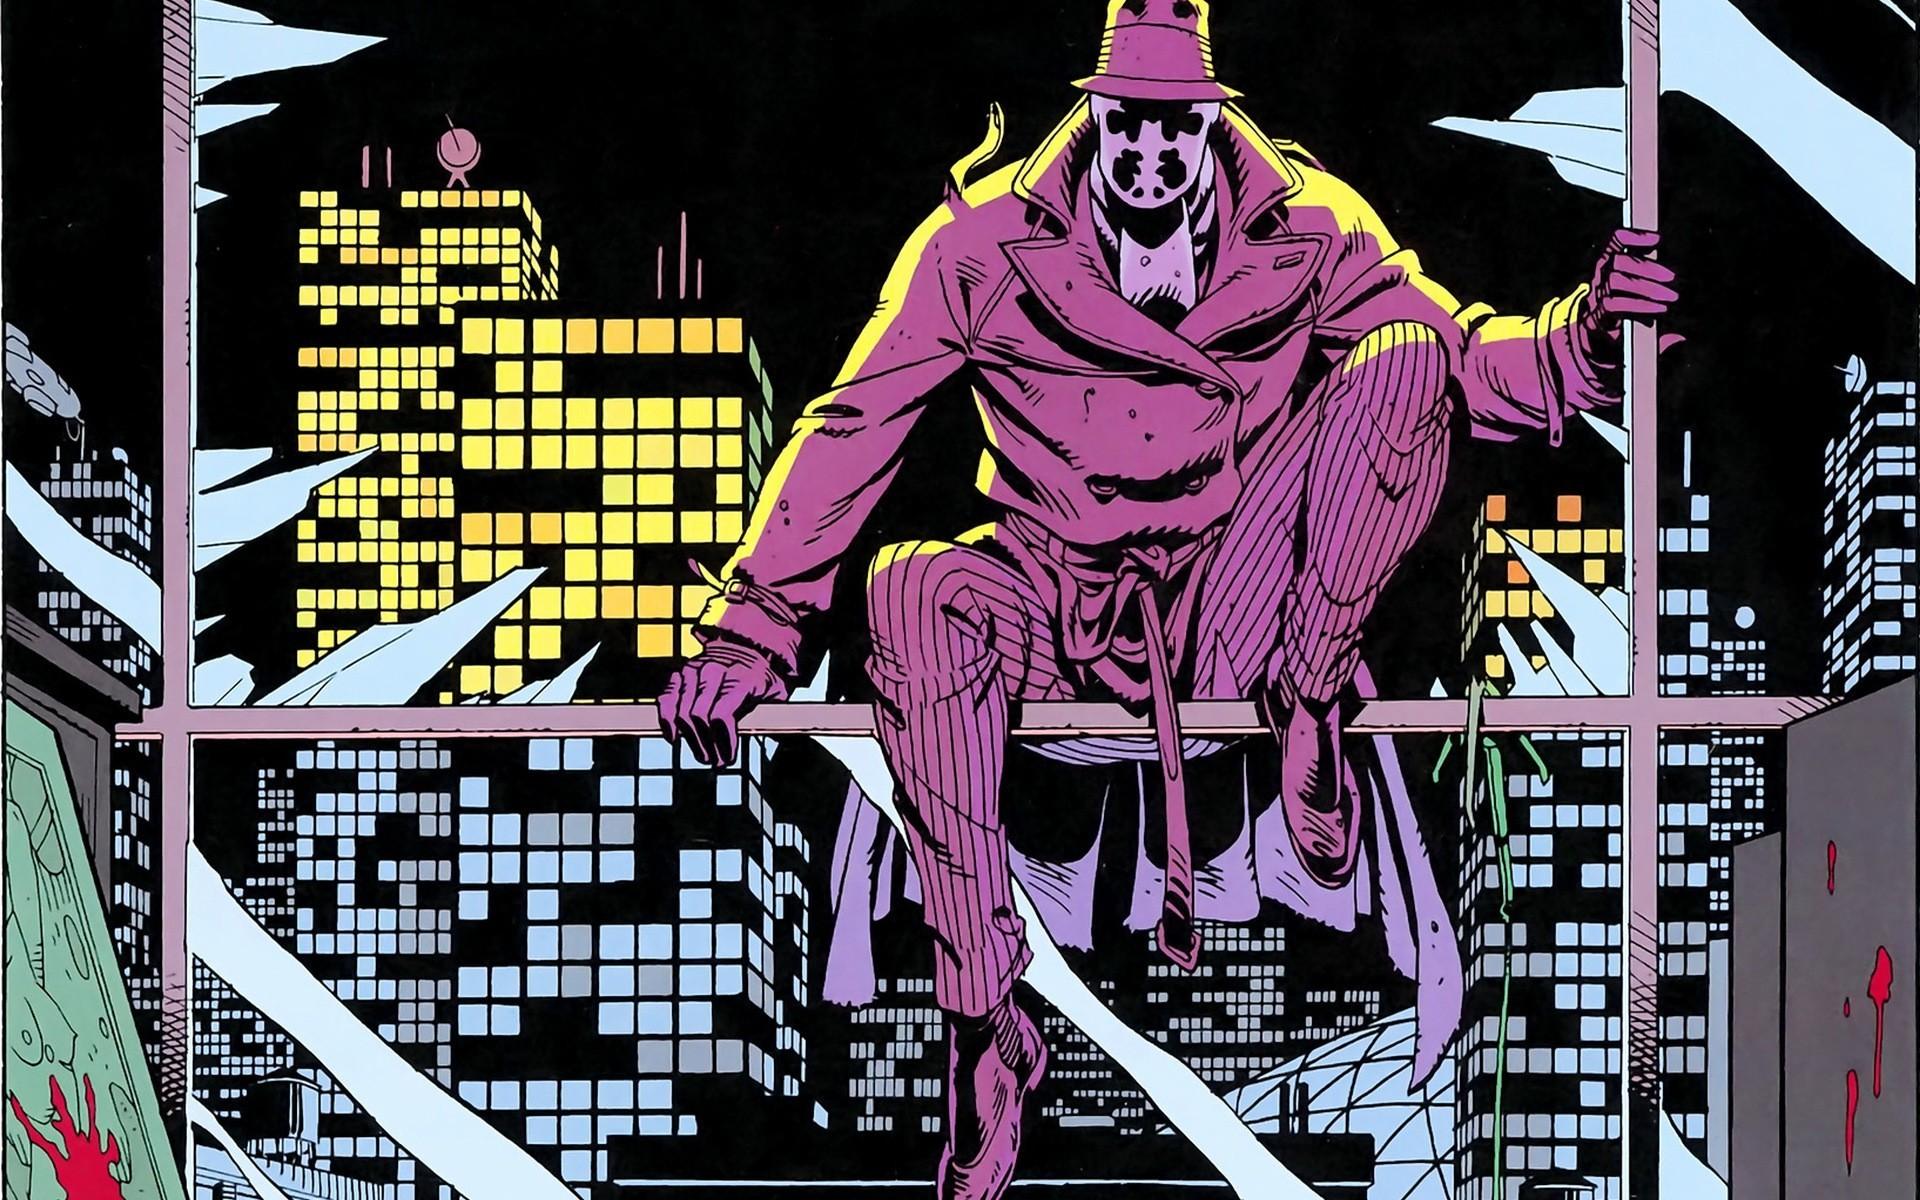 Rorschach in Watchmen #1, DC Comics (1986).